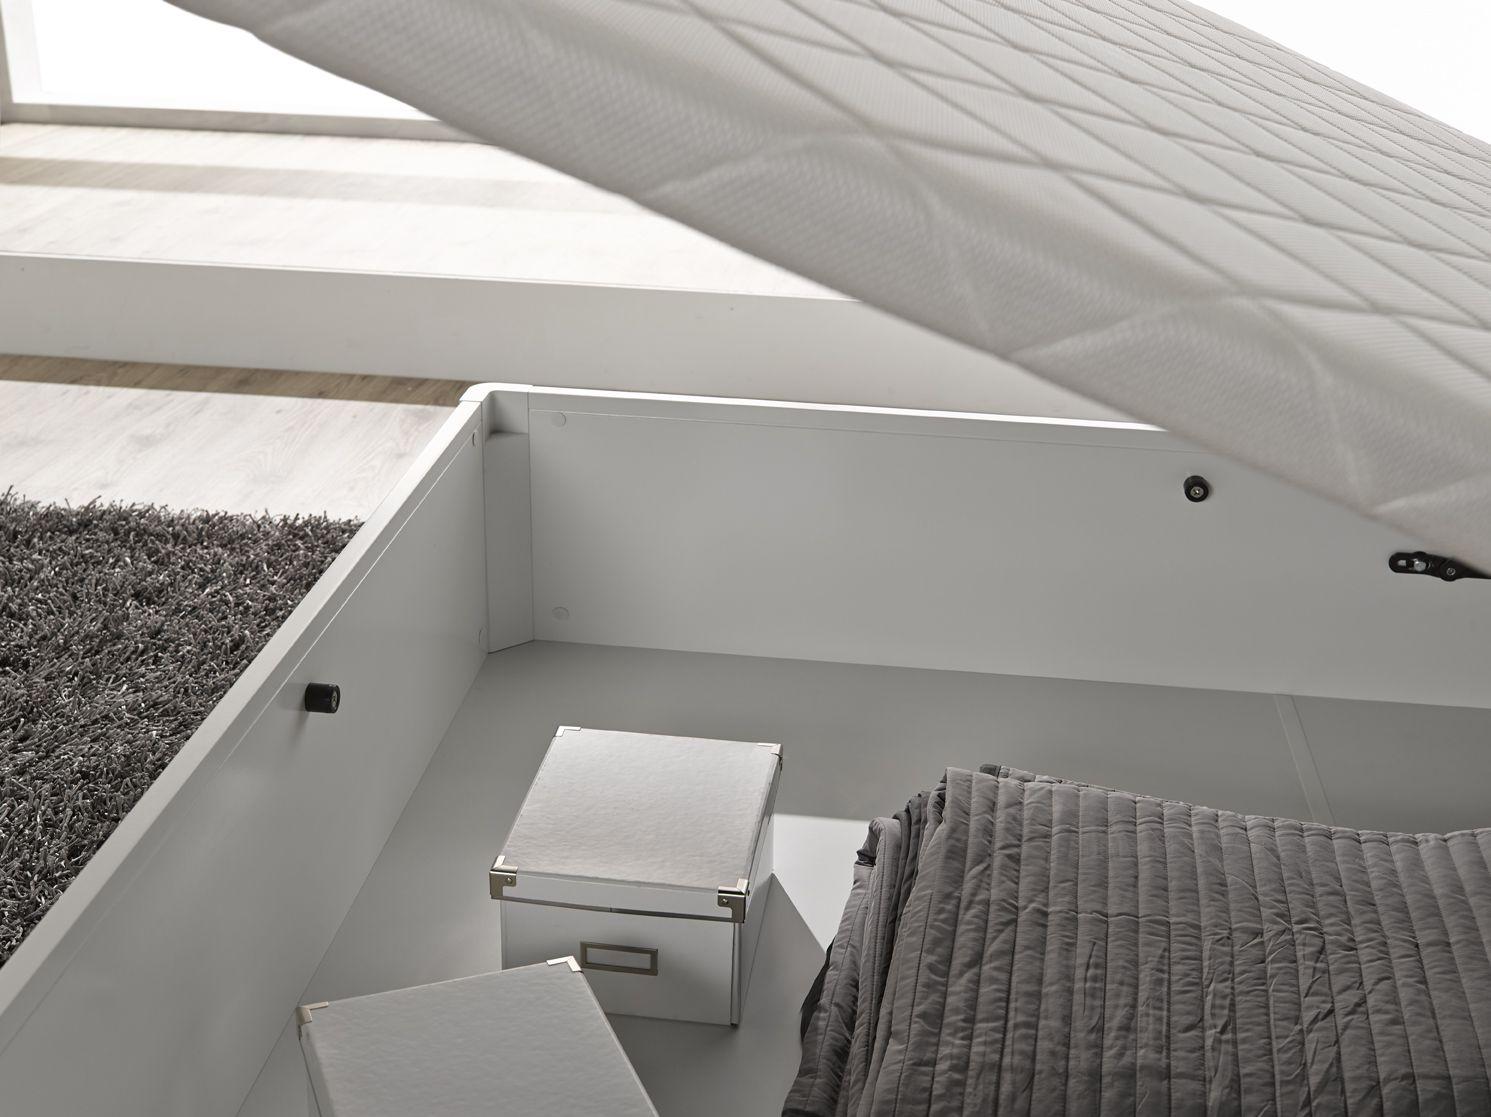 Foto 27 de fabricaci n de muebles en yecla solopatas - Fabrica de muebles yecla ...